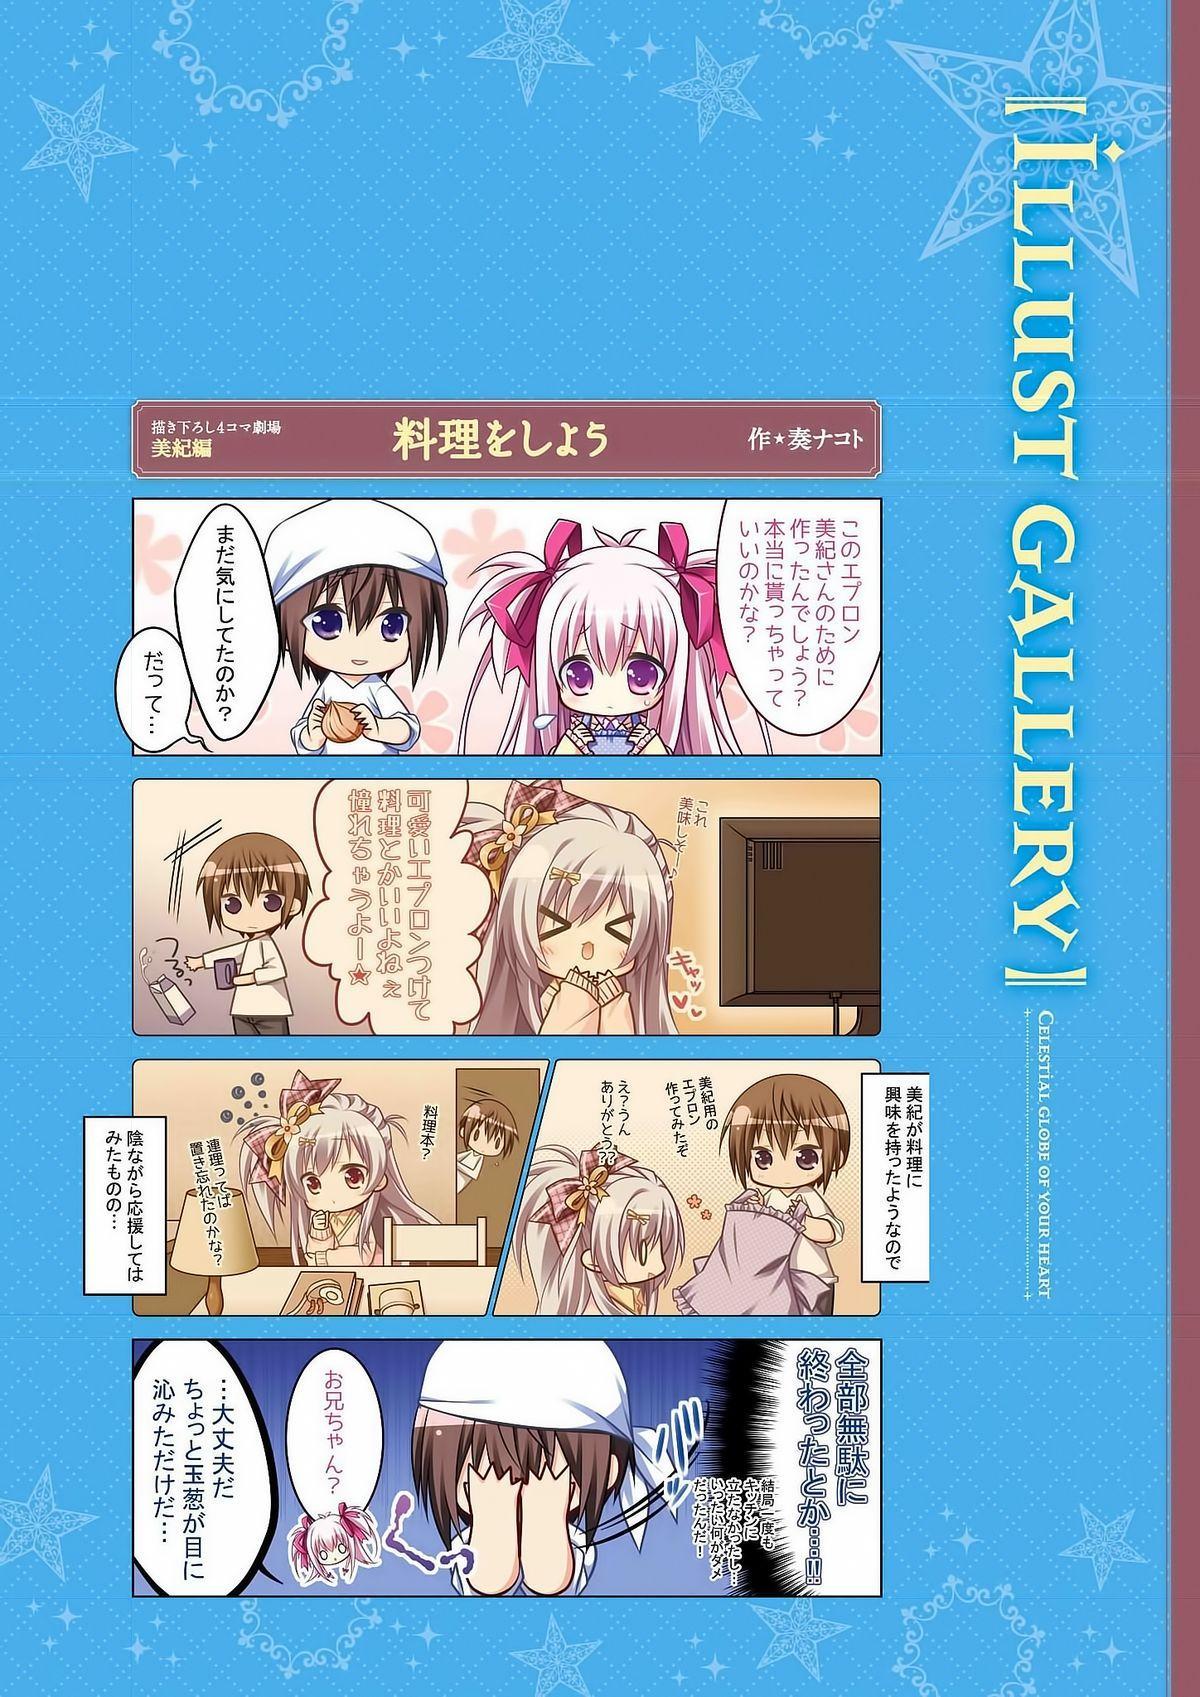 Sekai to Sekai no Mannaka de Visual Fanbook 83